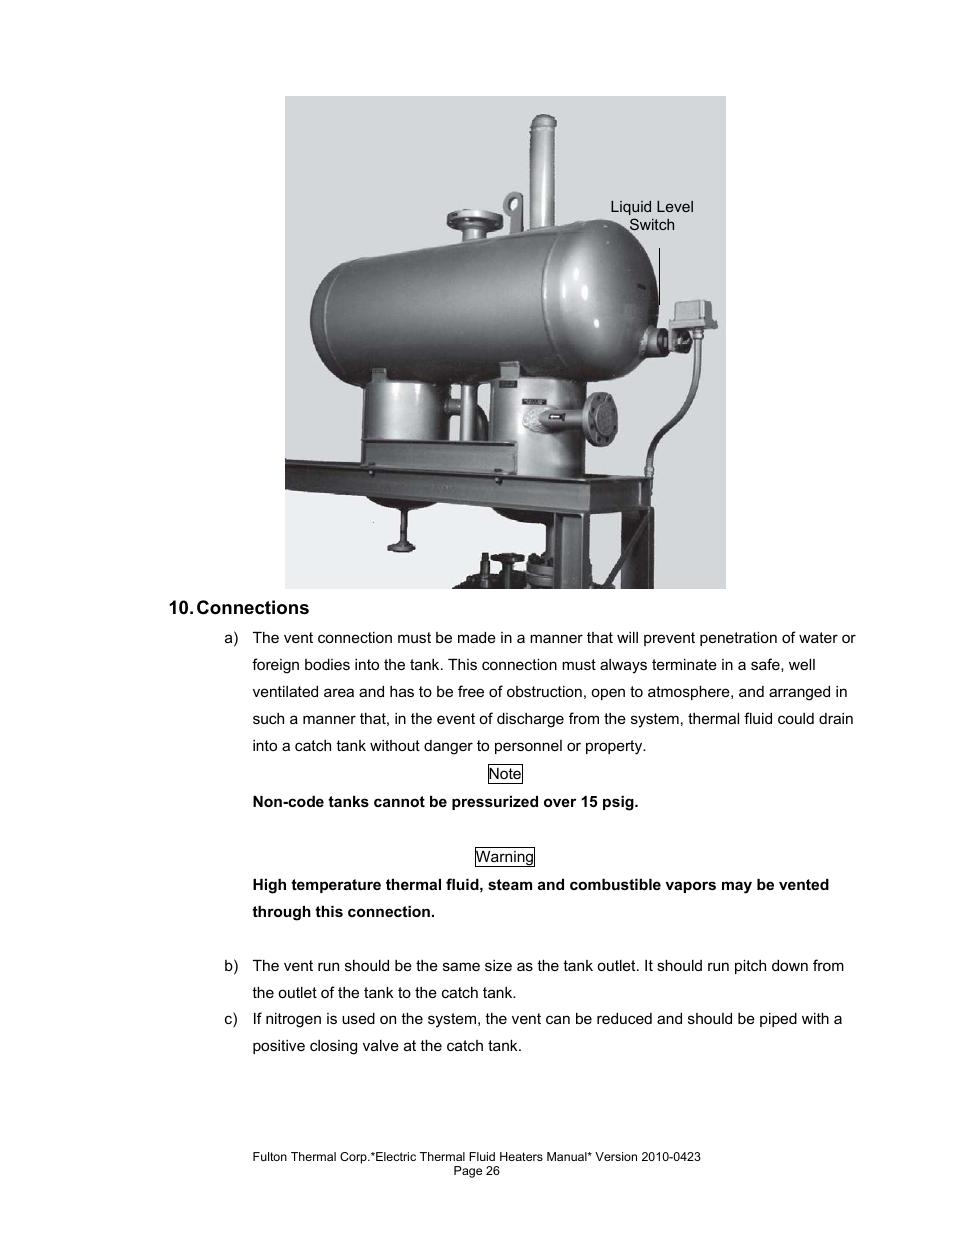 fulton vertical electric ft n thermal fluid hot oil heater user rh manualsdir com